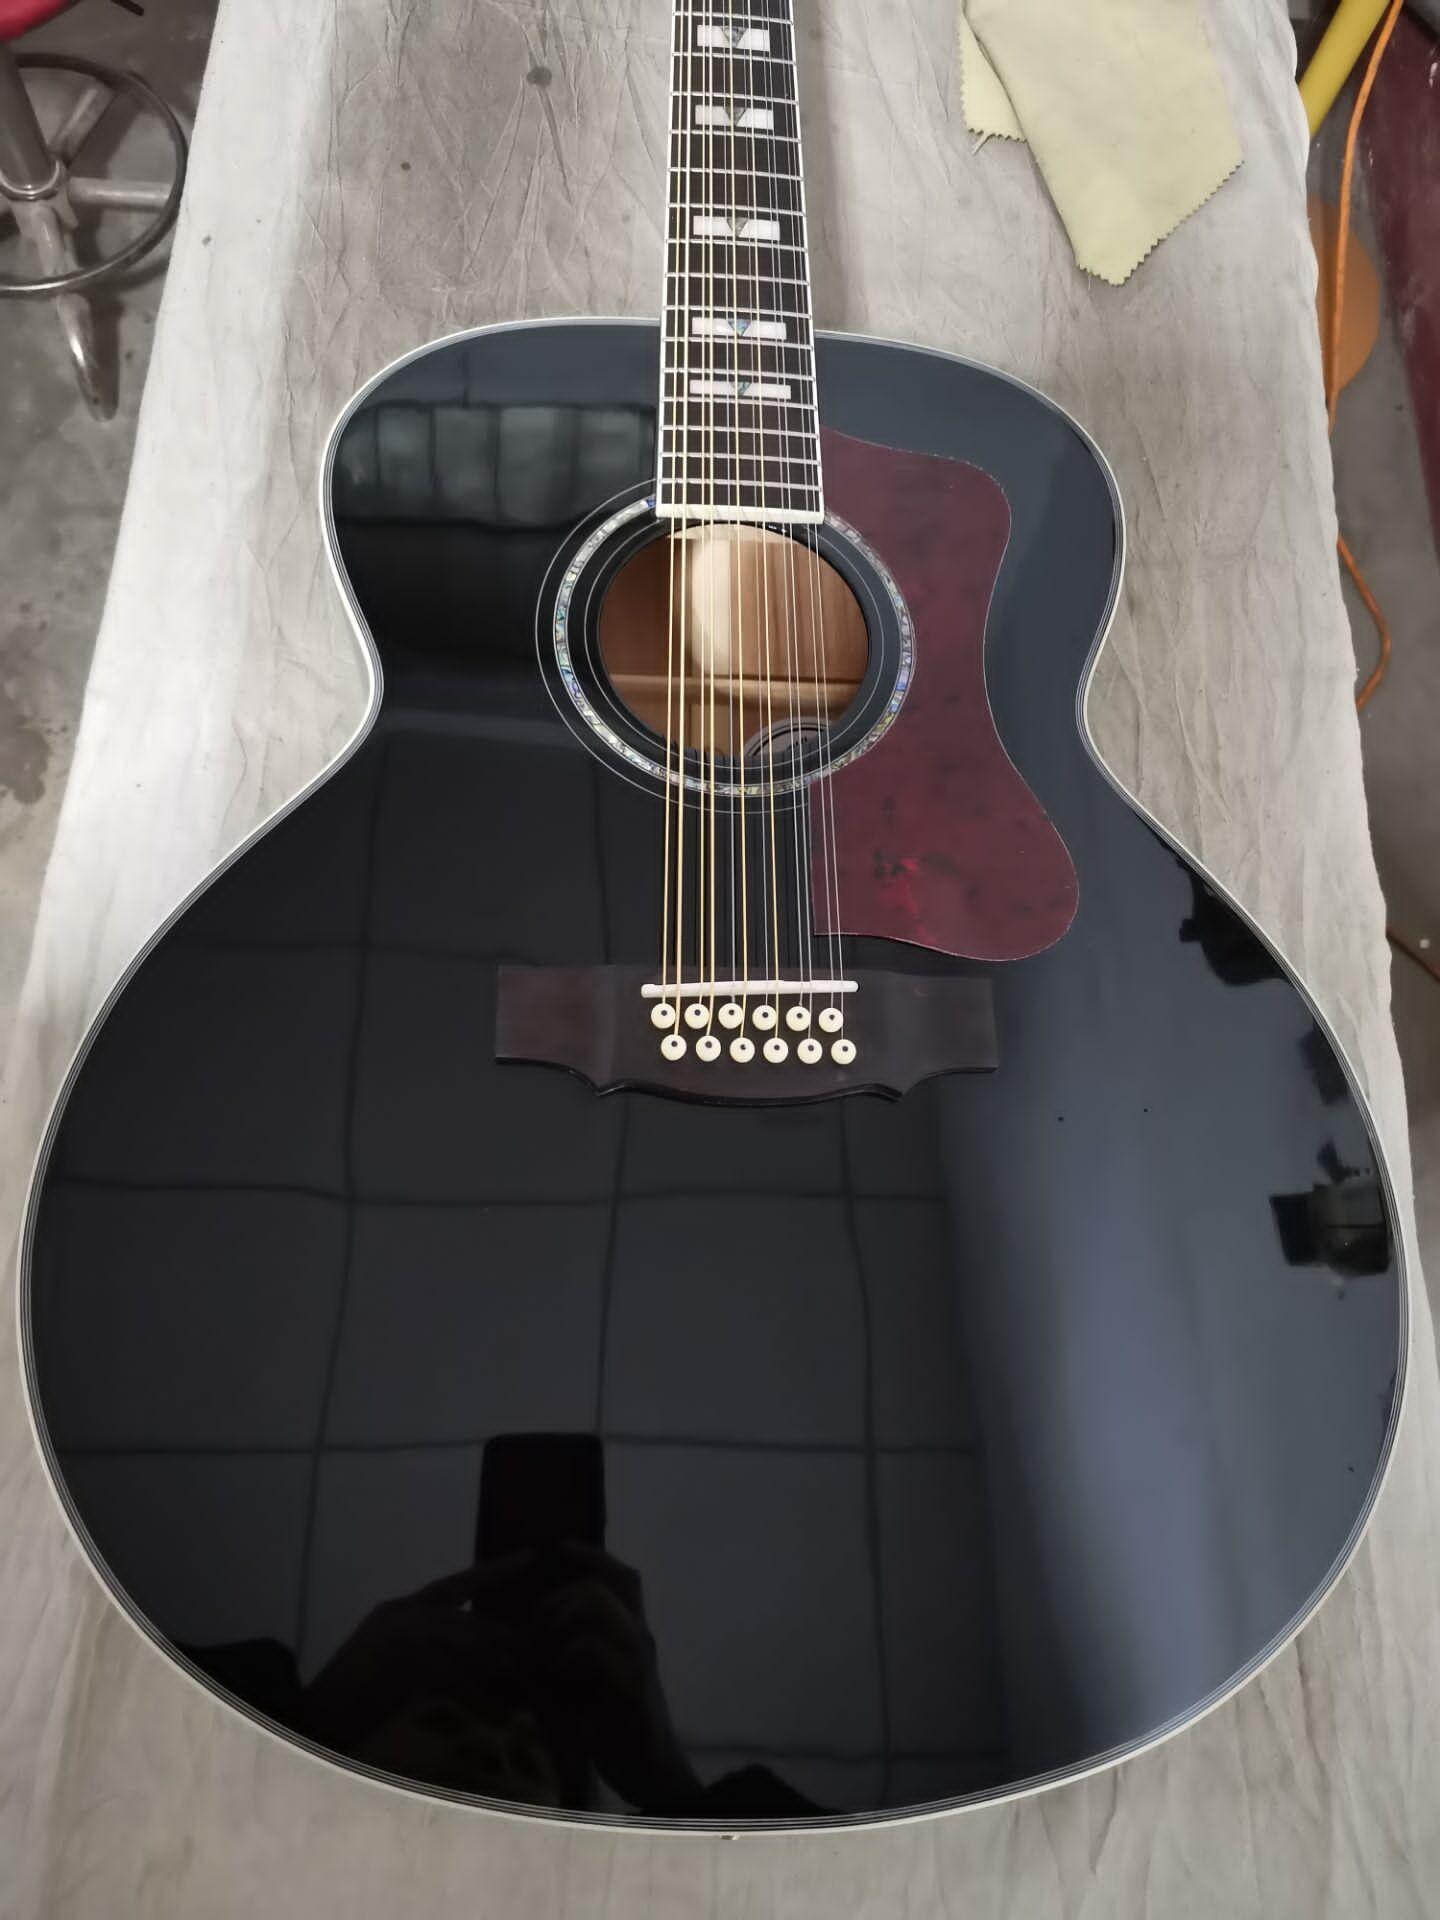 Guitarra acústica de color negro brillante, jumbo acústico, F512, tamaño jumbo, 12 cuerdas, guitarra acústica sólida, estilo guild